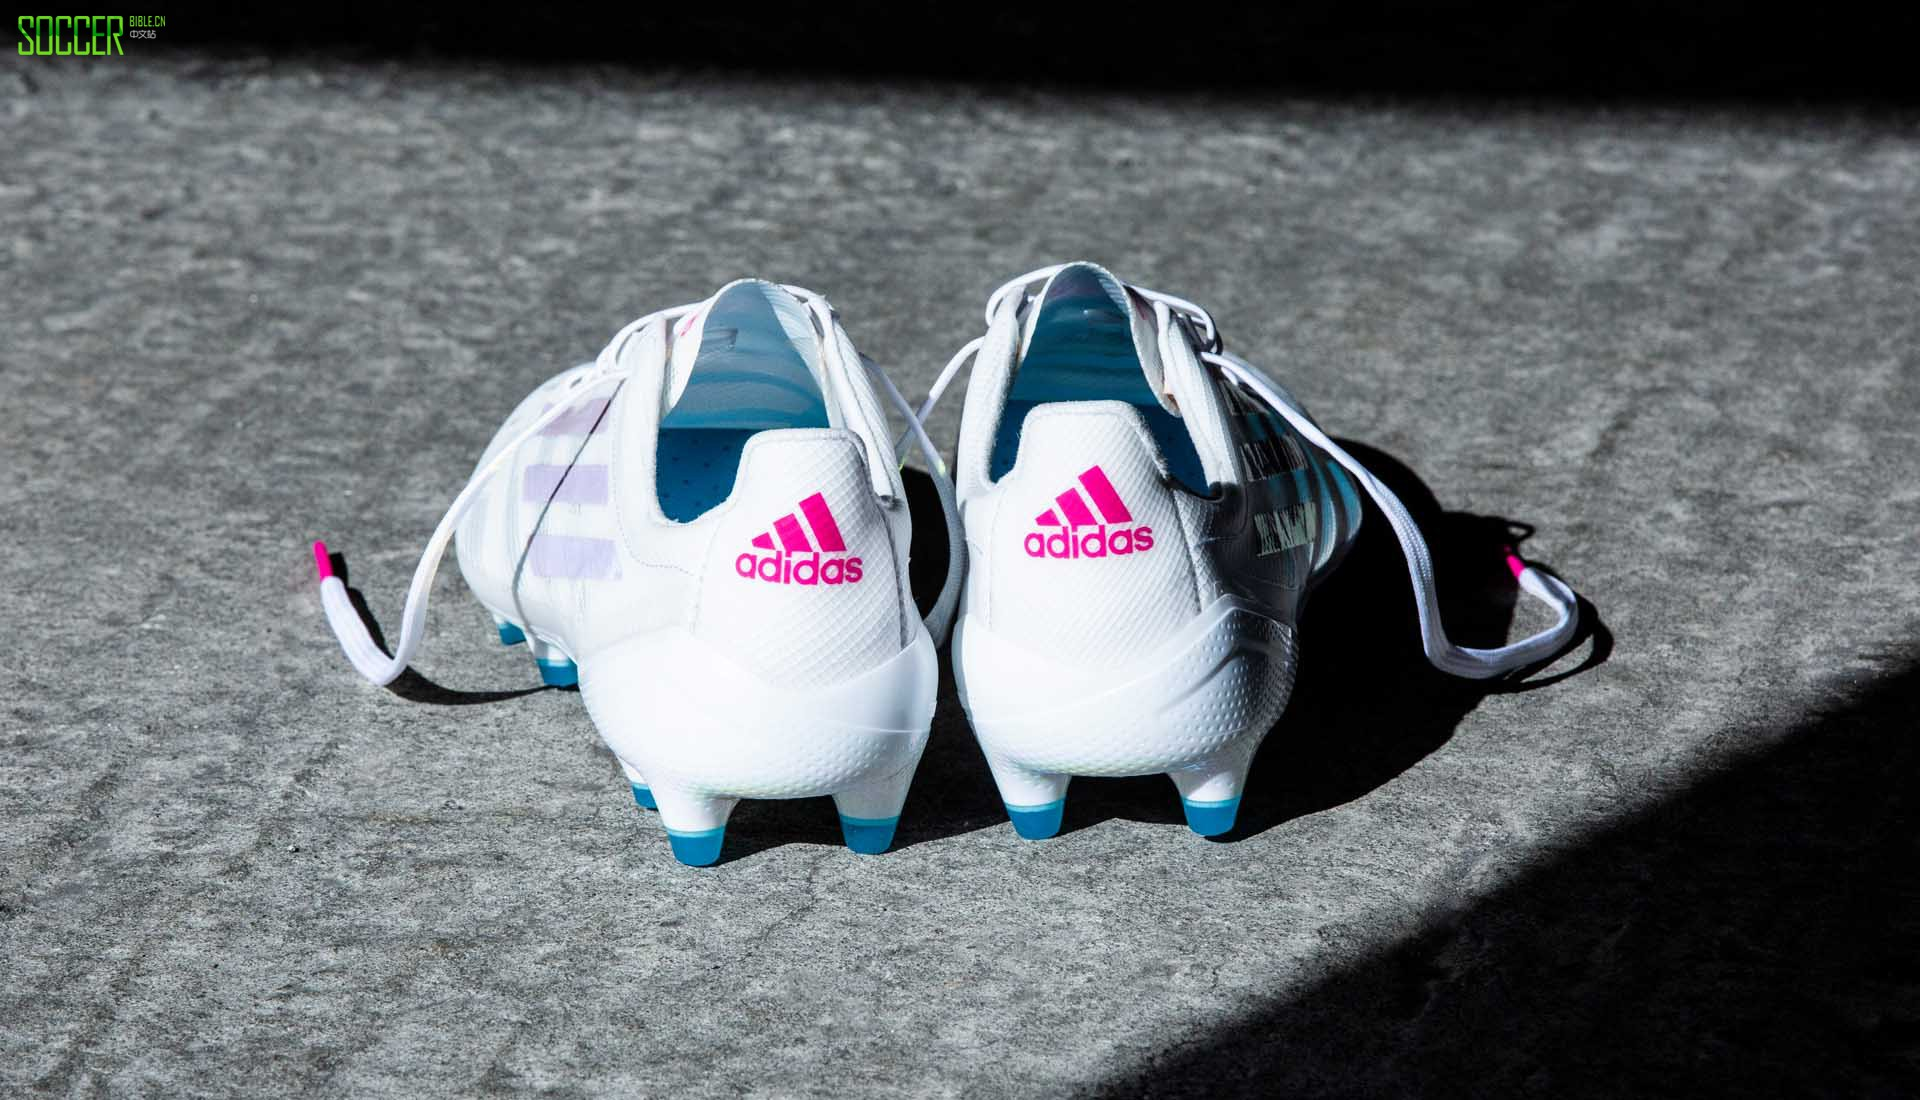 5-adidas-99-boot-min